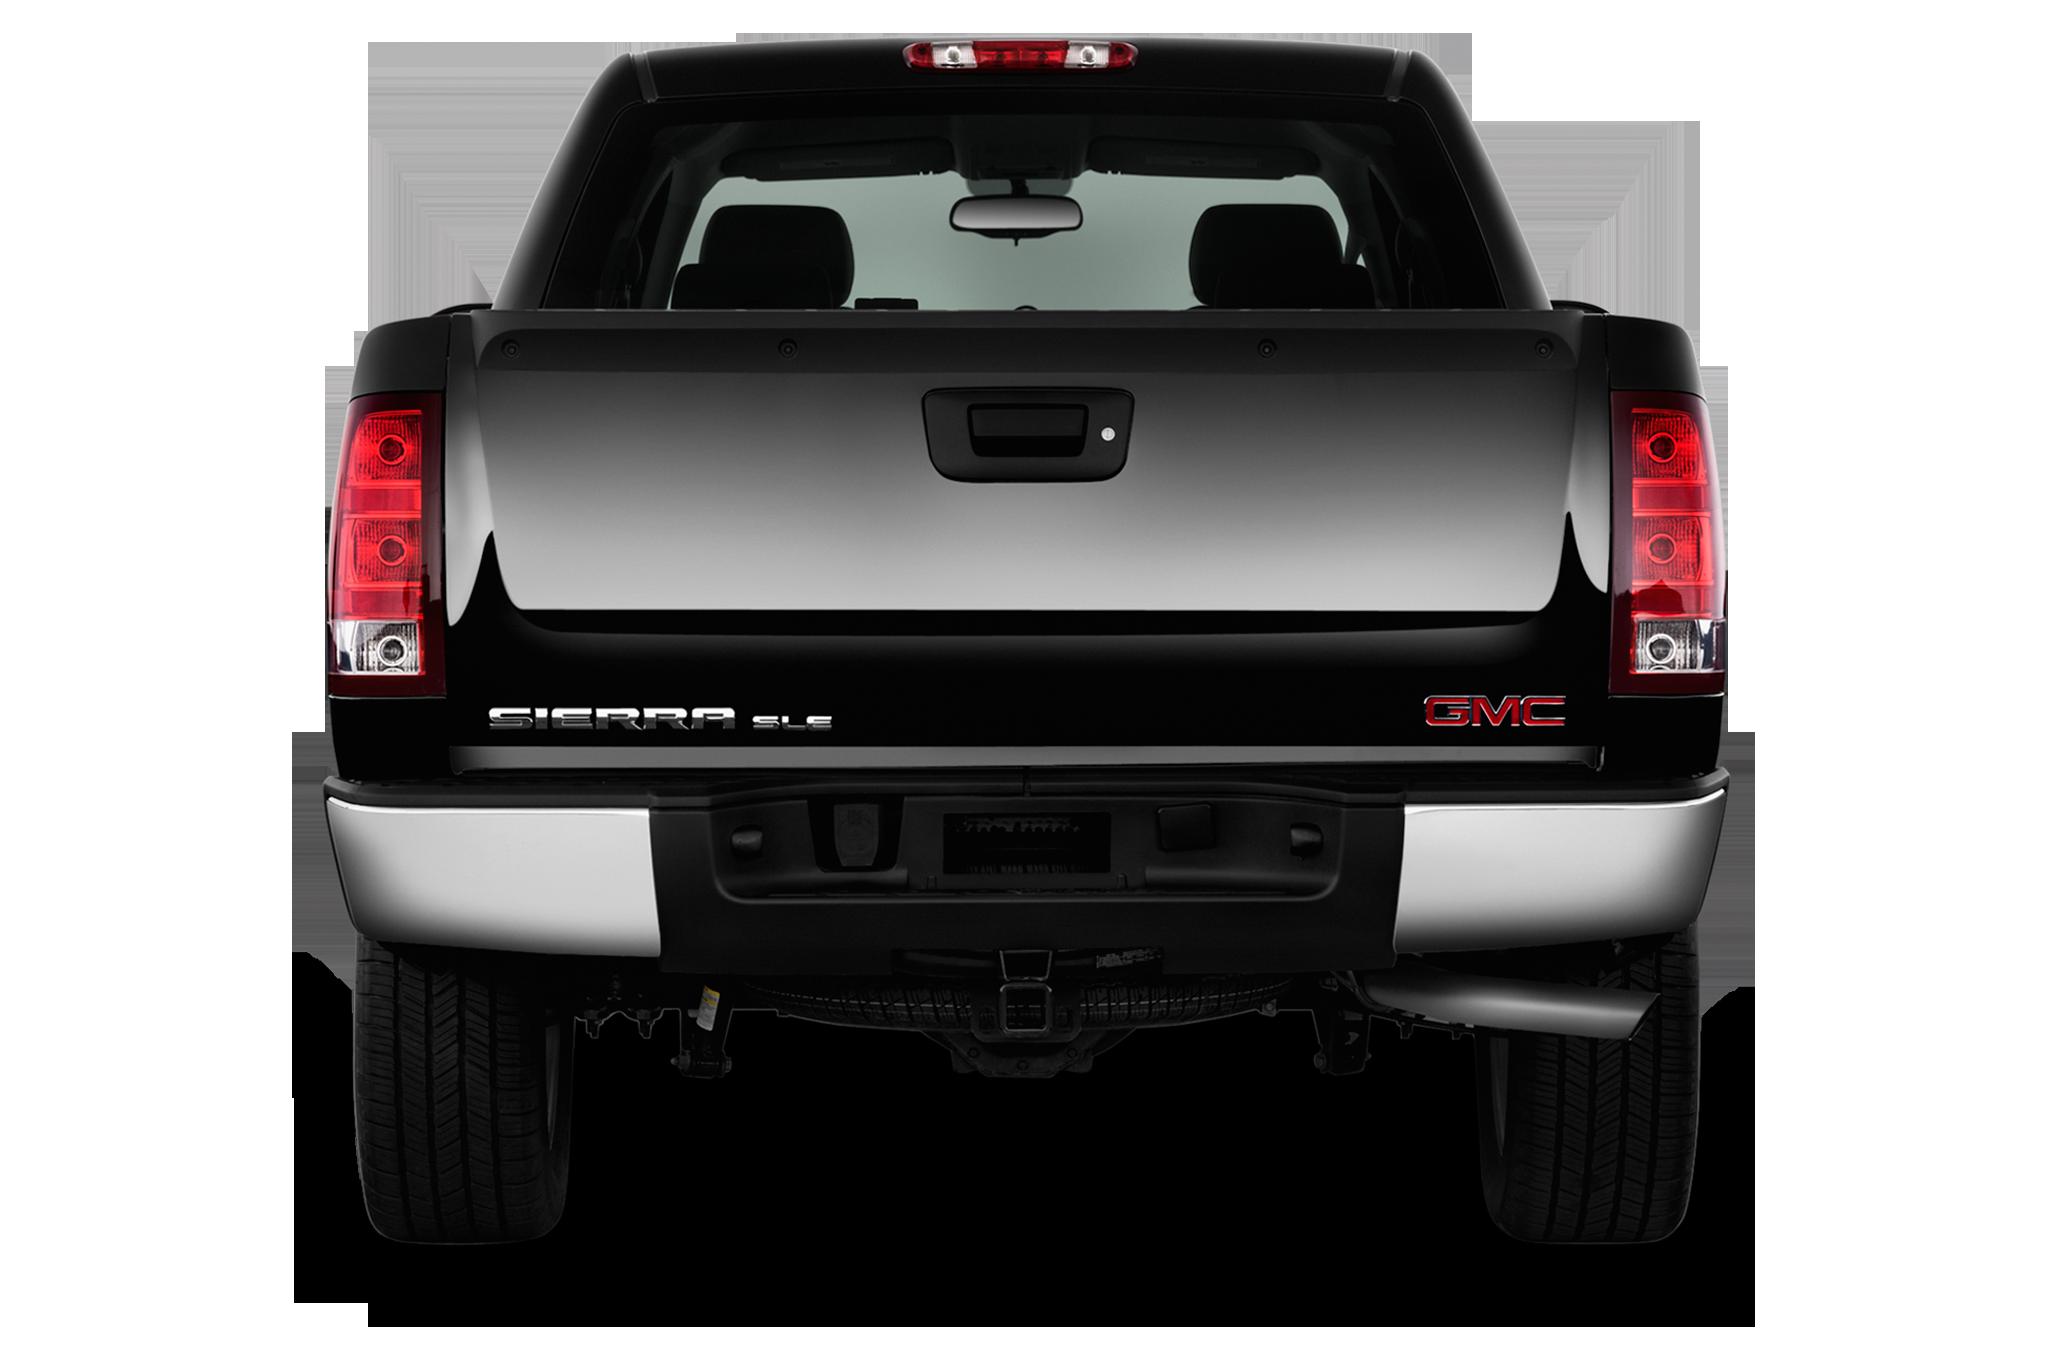 Spied Next Gen Chevrolet Silverado Hits The Streets